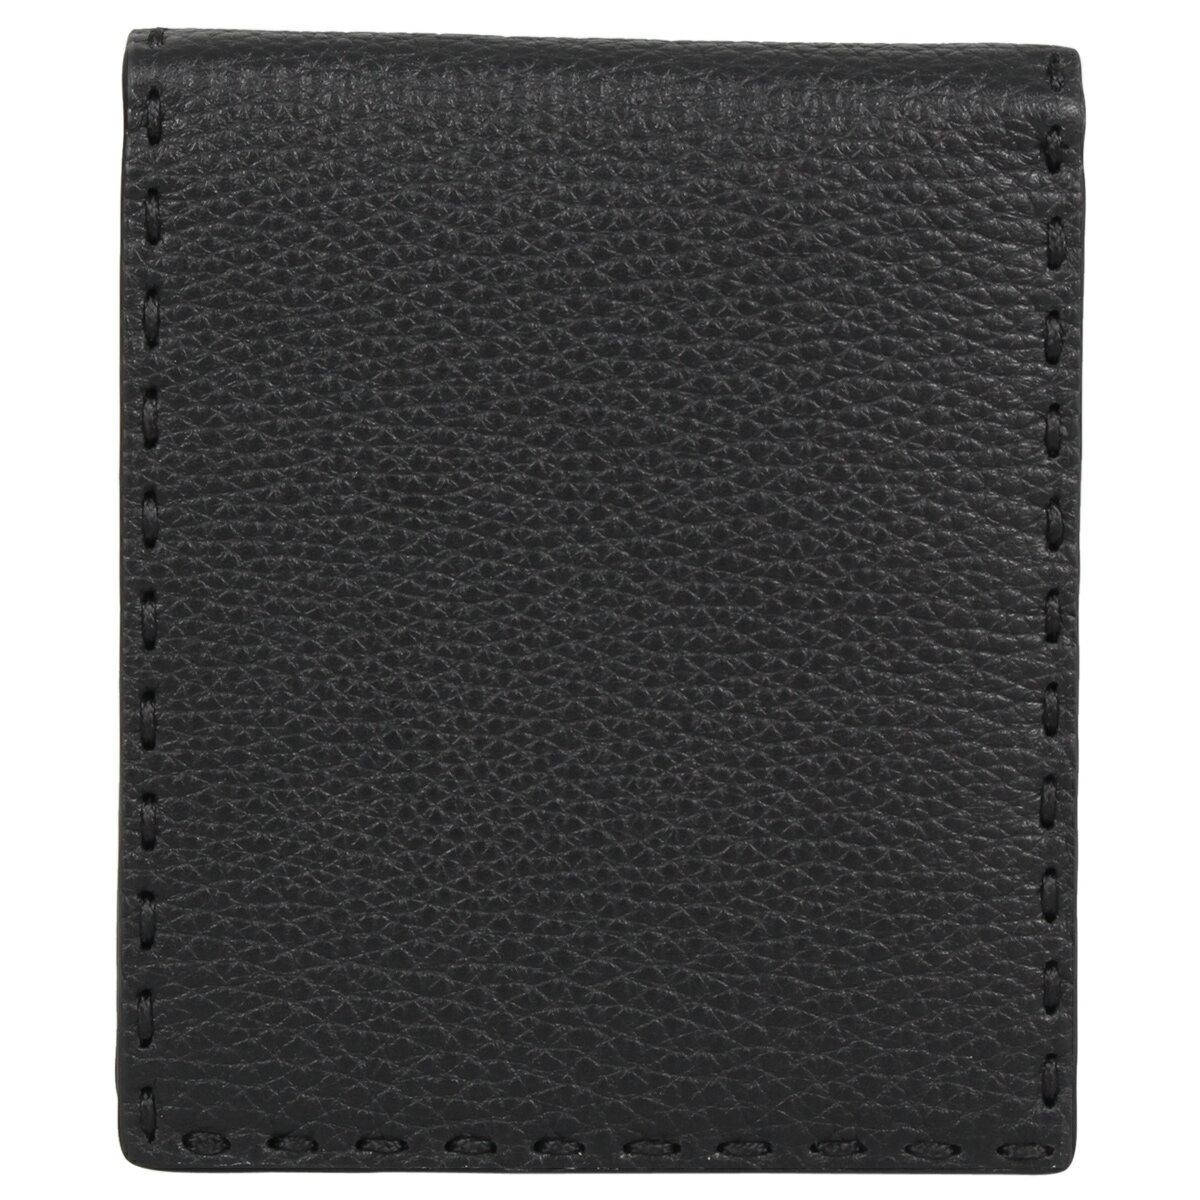 FENDI(フェンディ)『二つ折り財布(7M0193O7NF0GXN)』